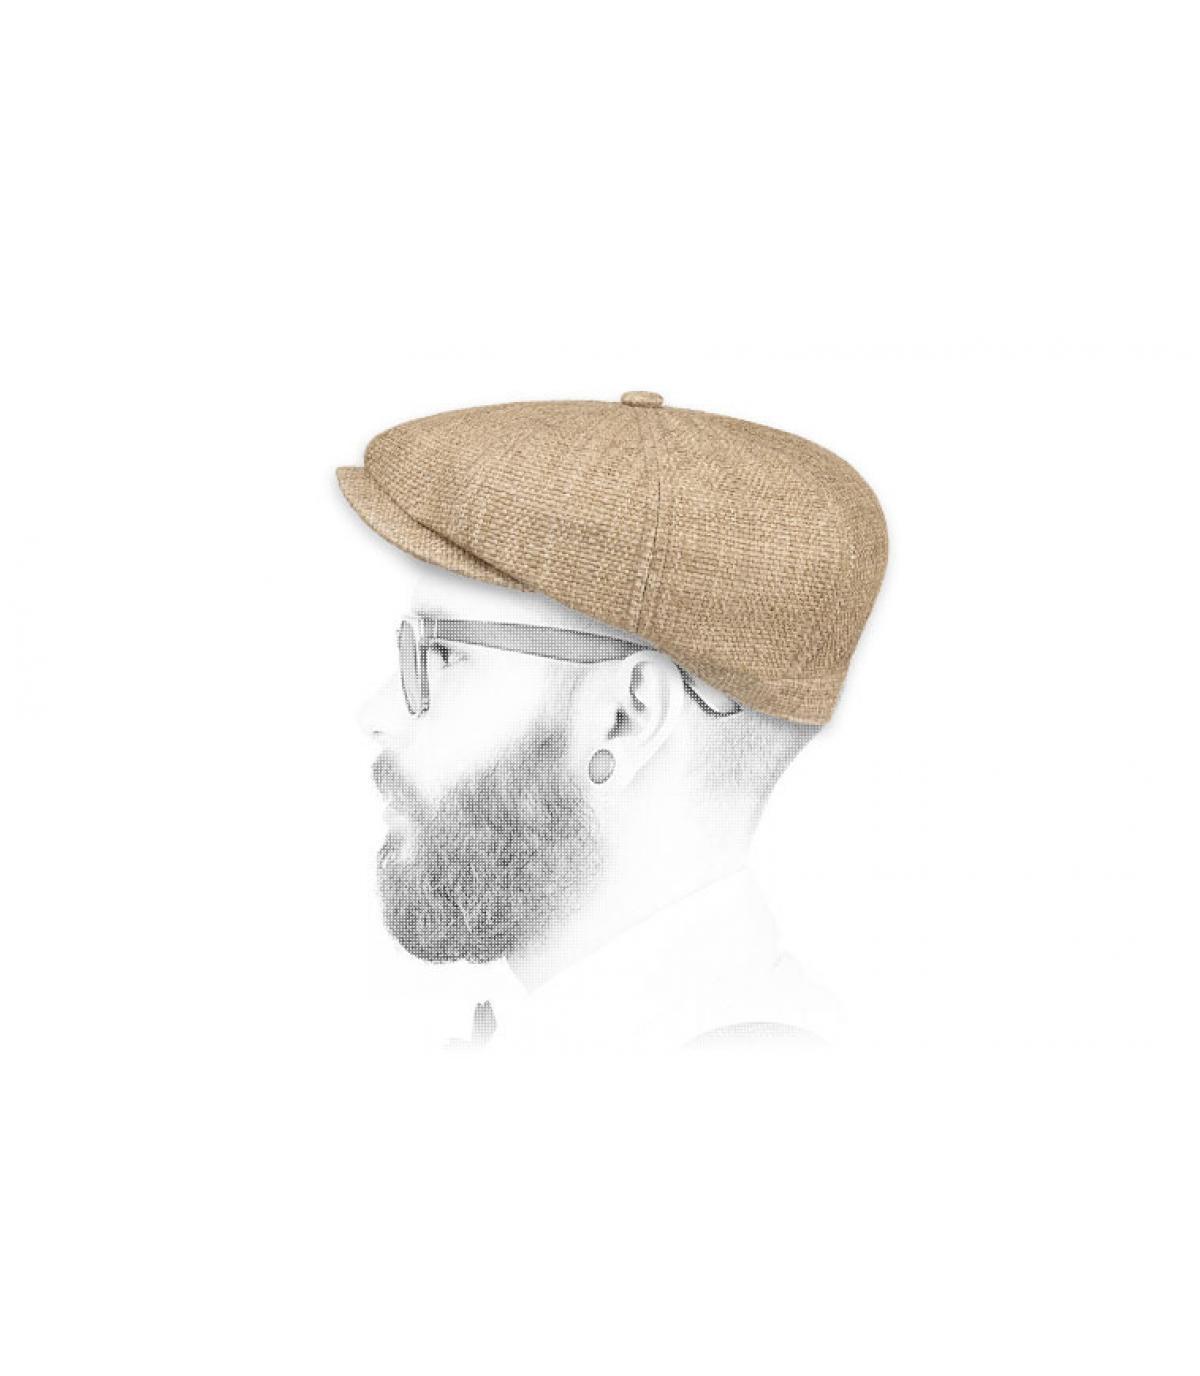 krantenverkoper cap stro Stetson